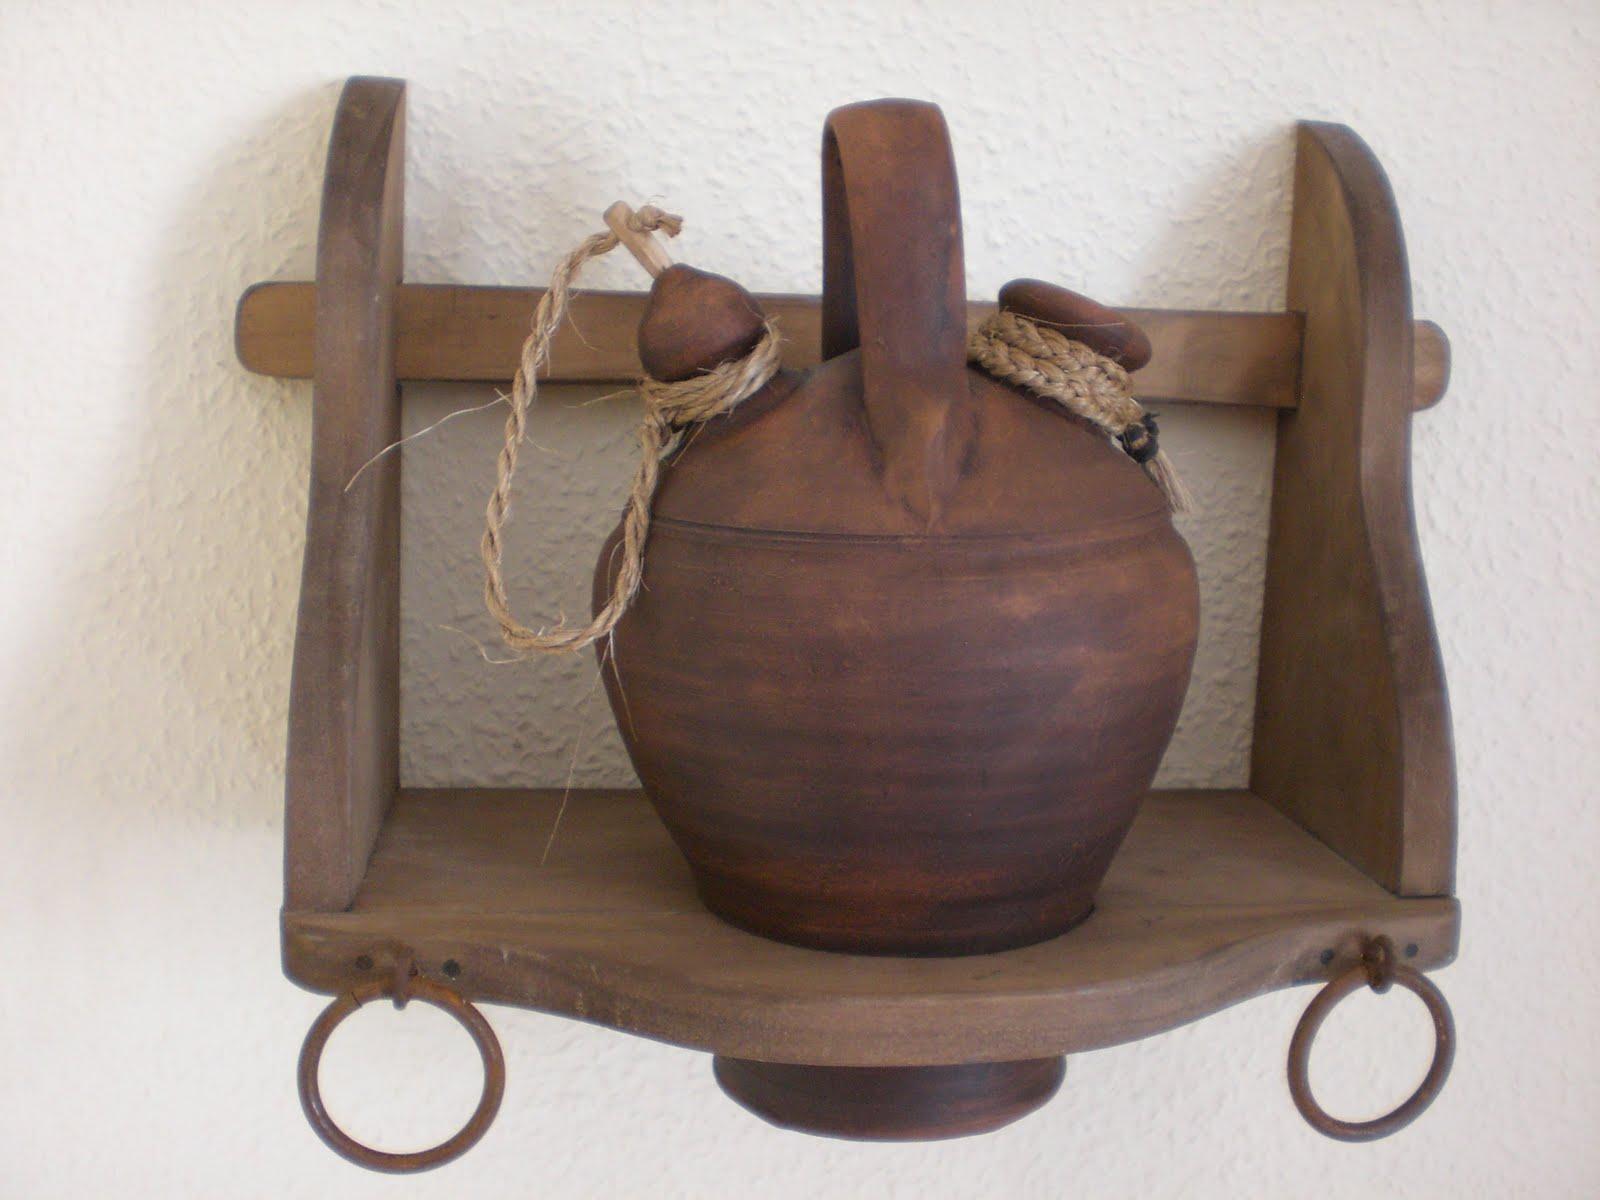 Artesan a r stica en madera botijera de madera con for Artesanias en madera